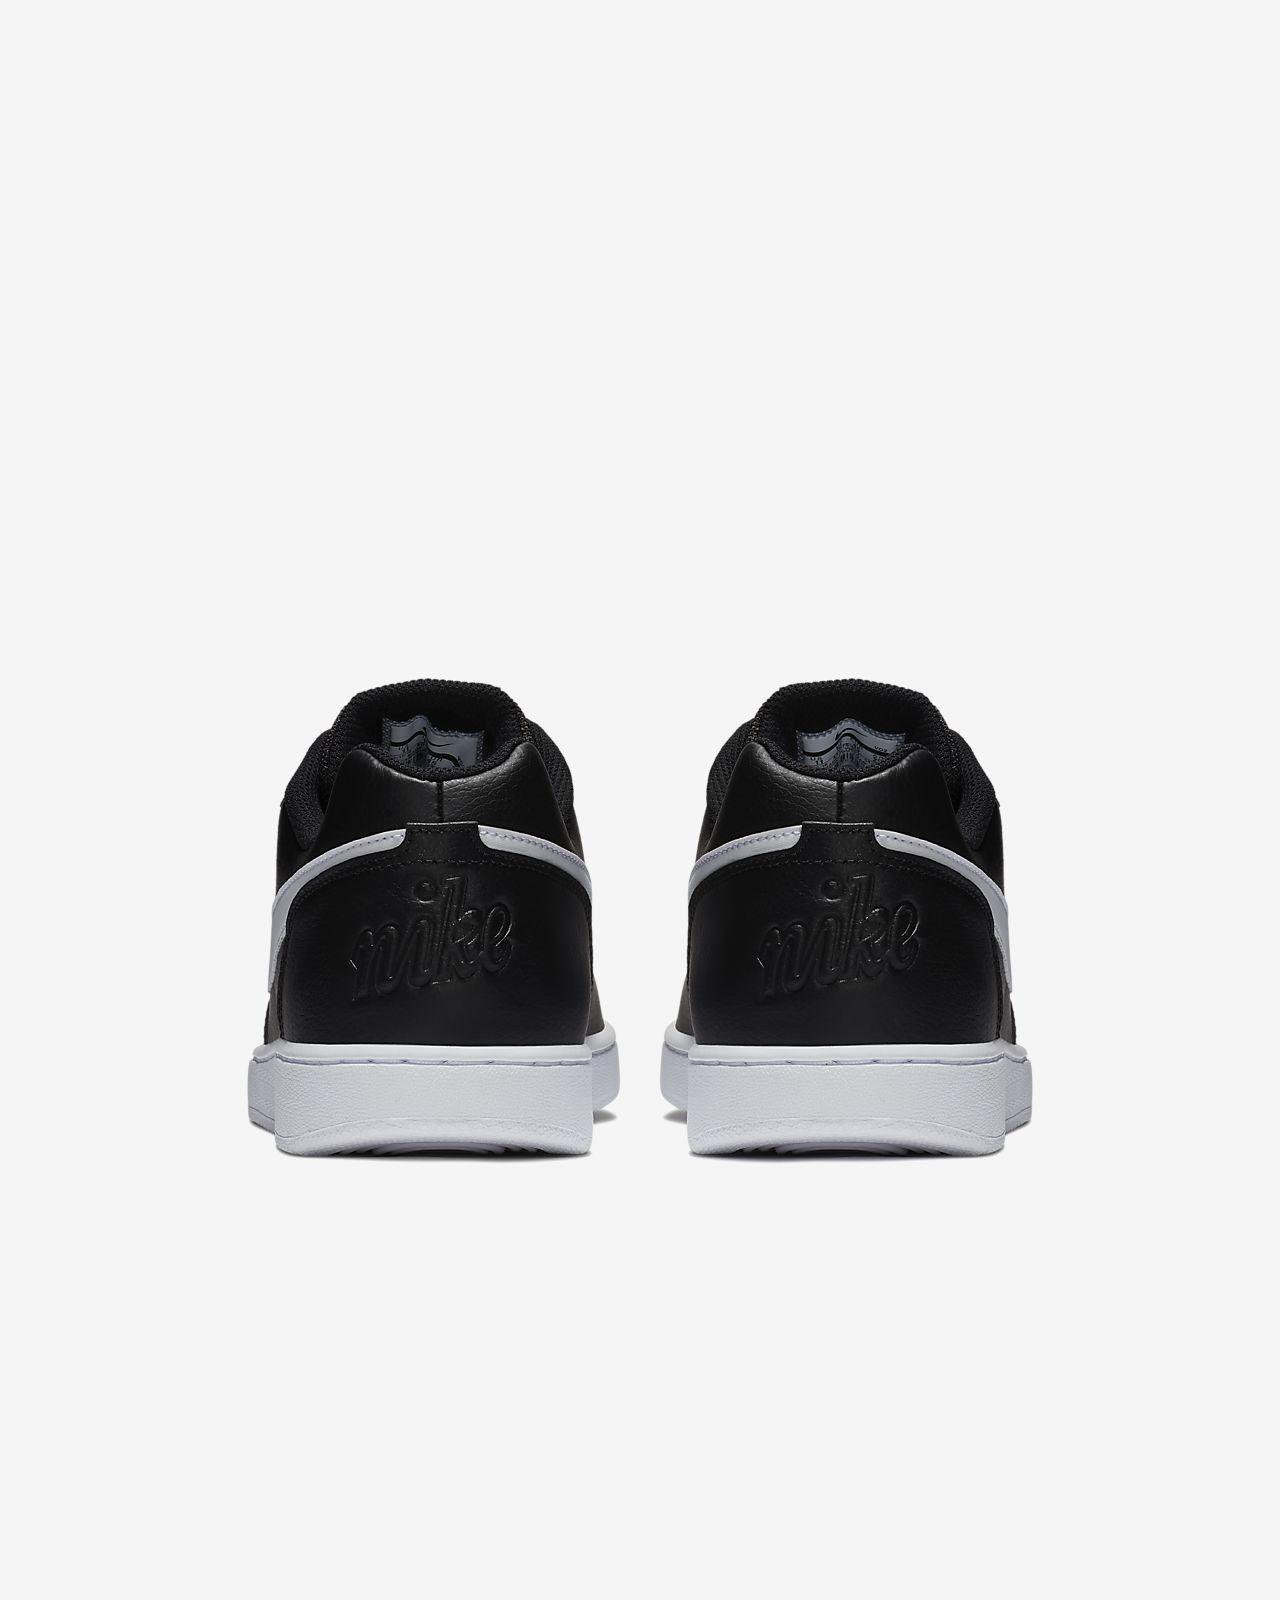 Nike Ebernon Low Men's Shoe